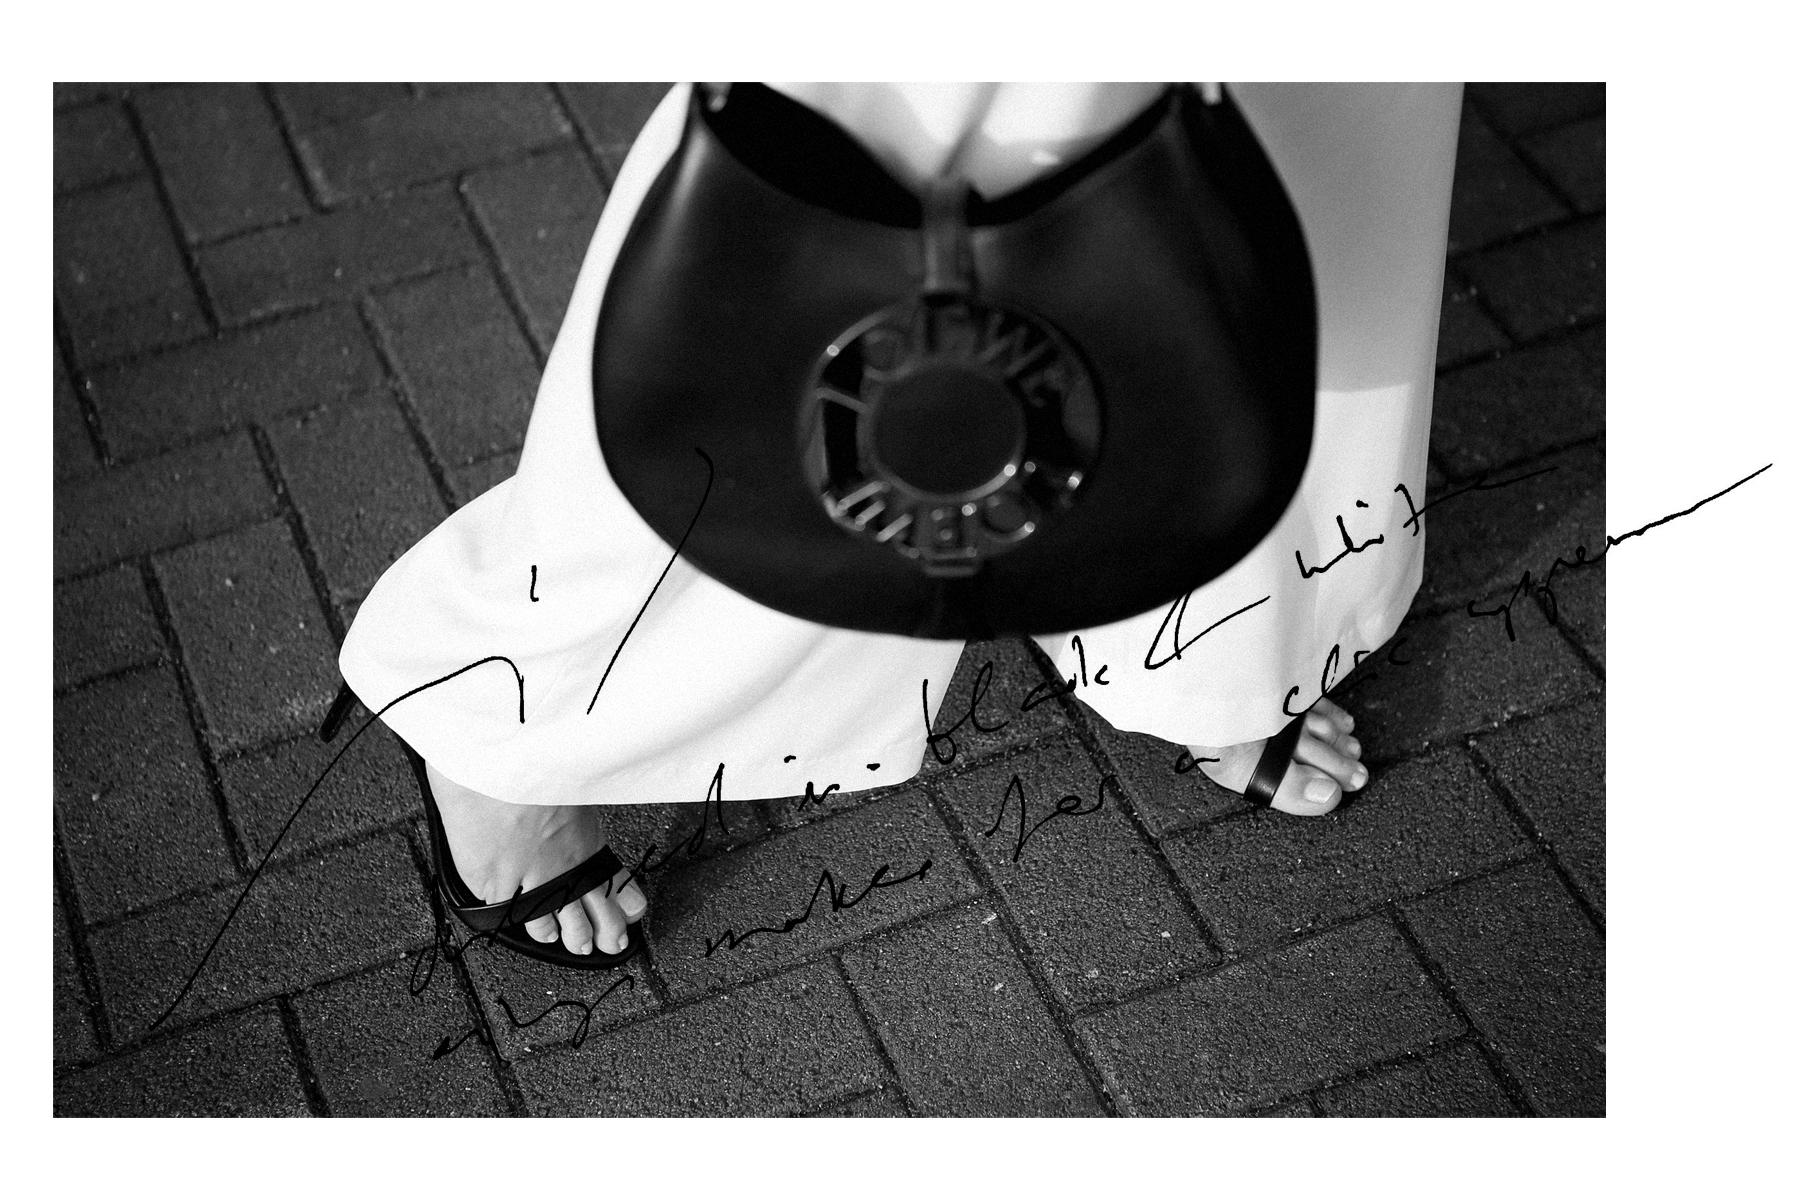 breuninger fashion show s/s 2017 ready to wear shopping luxury gucci céline chloe alexander mcqueen loewe joyce bag shopping modenschau düsseldorf platformfashion breuningerdüsseldorf max bechmann cats & dogs fashionblog blog ricarda schernus 8